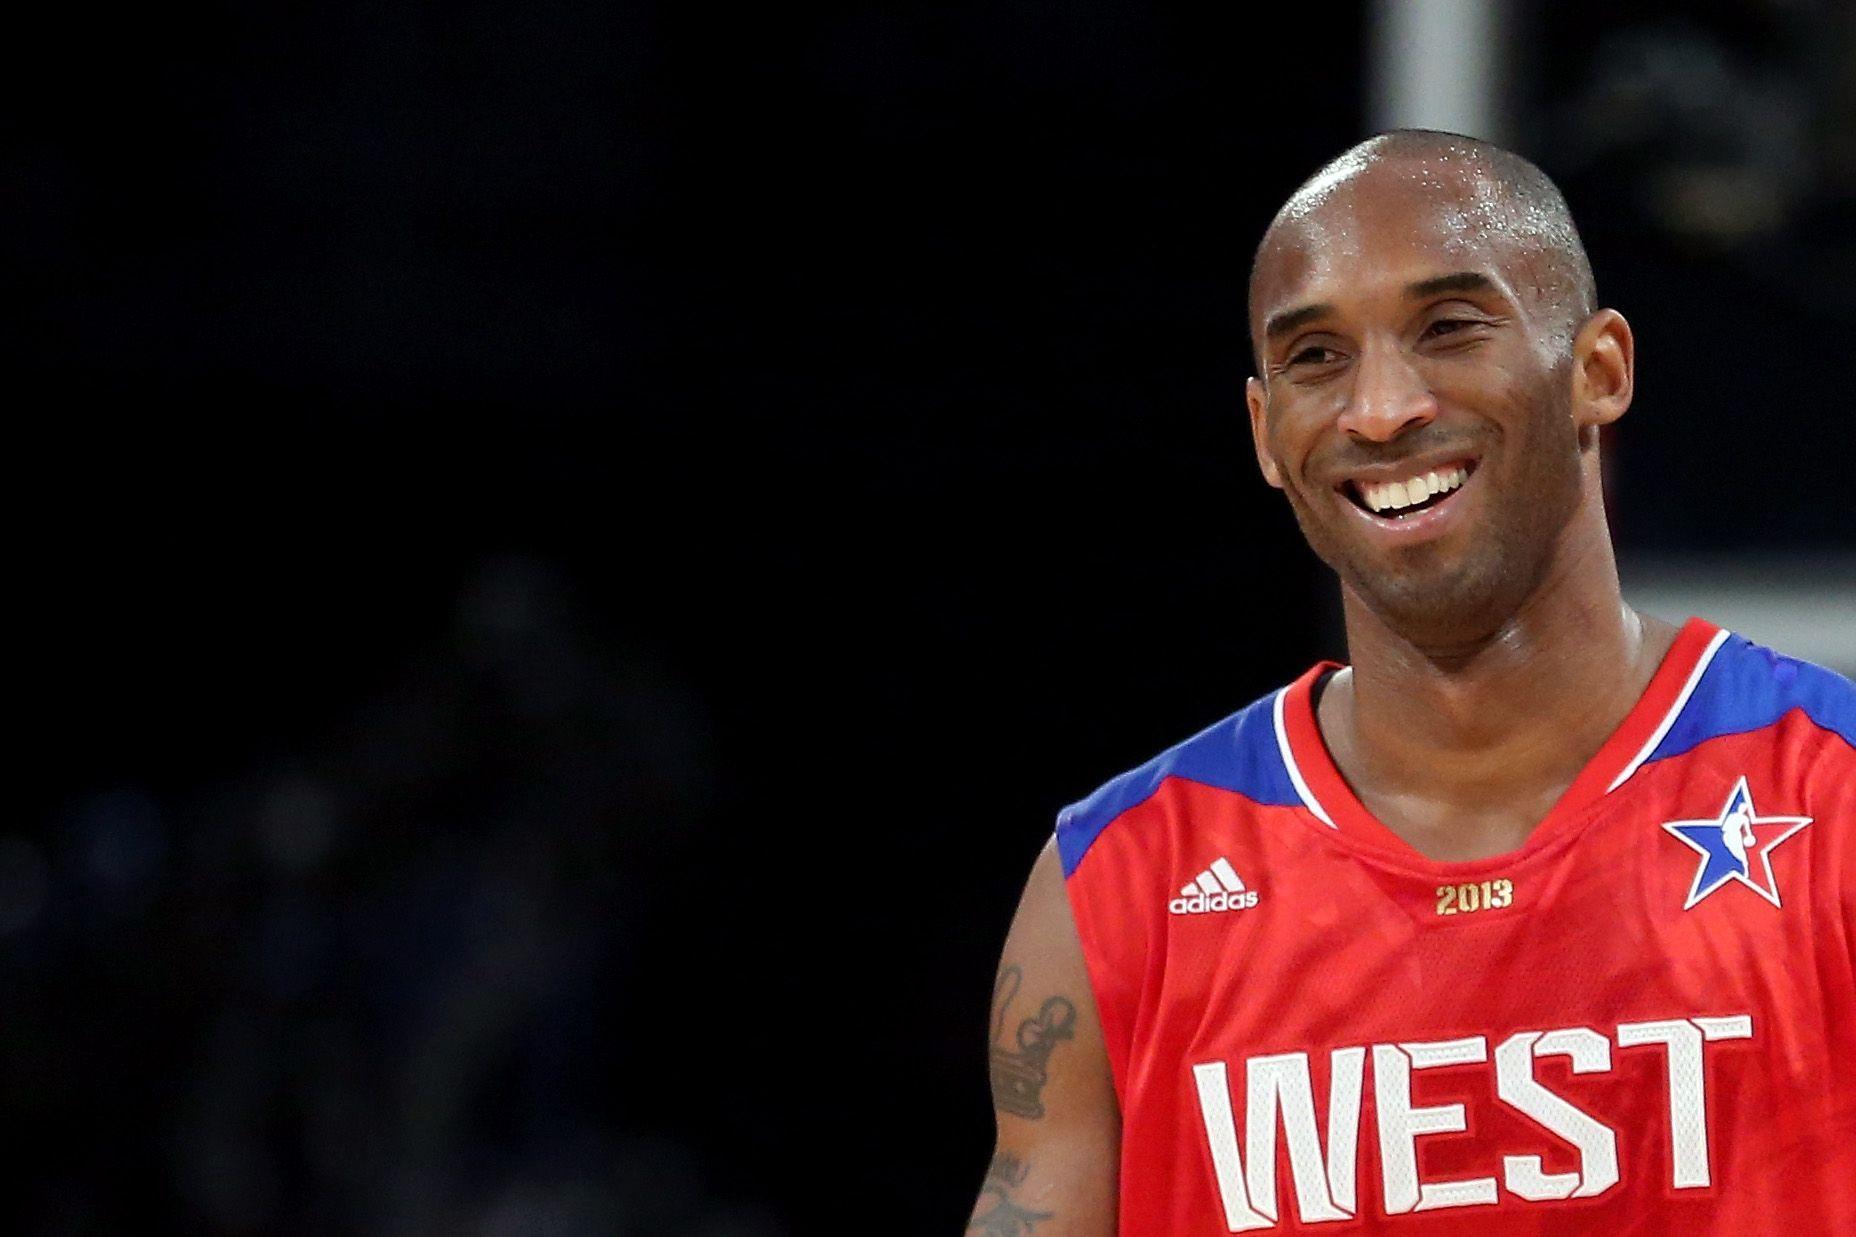 All Star Game 2016: vince l'Ovest ed è festa per Kobe Bryant